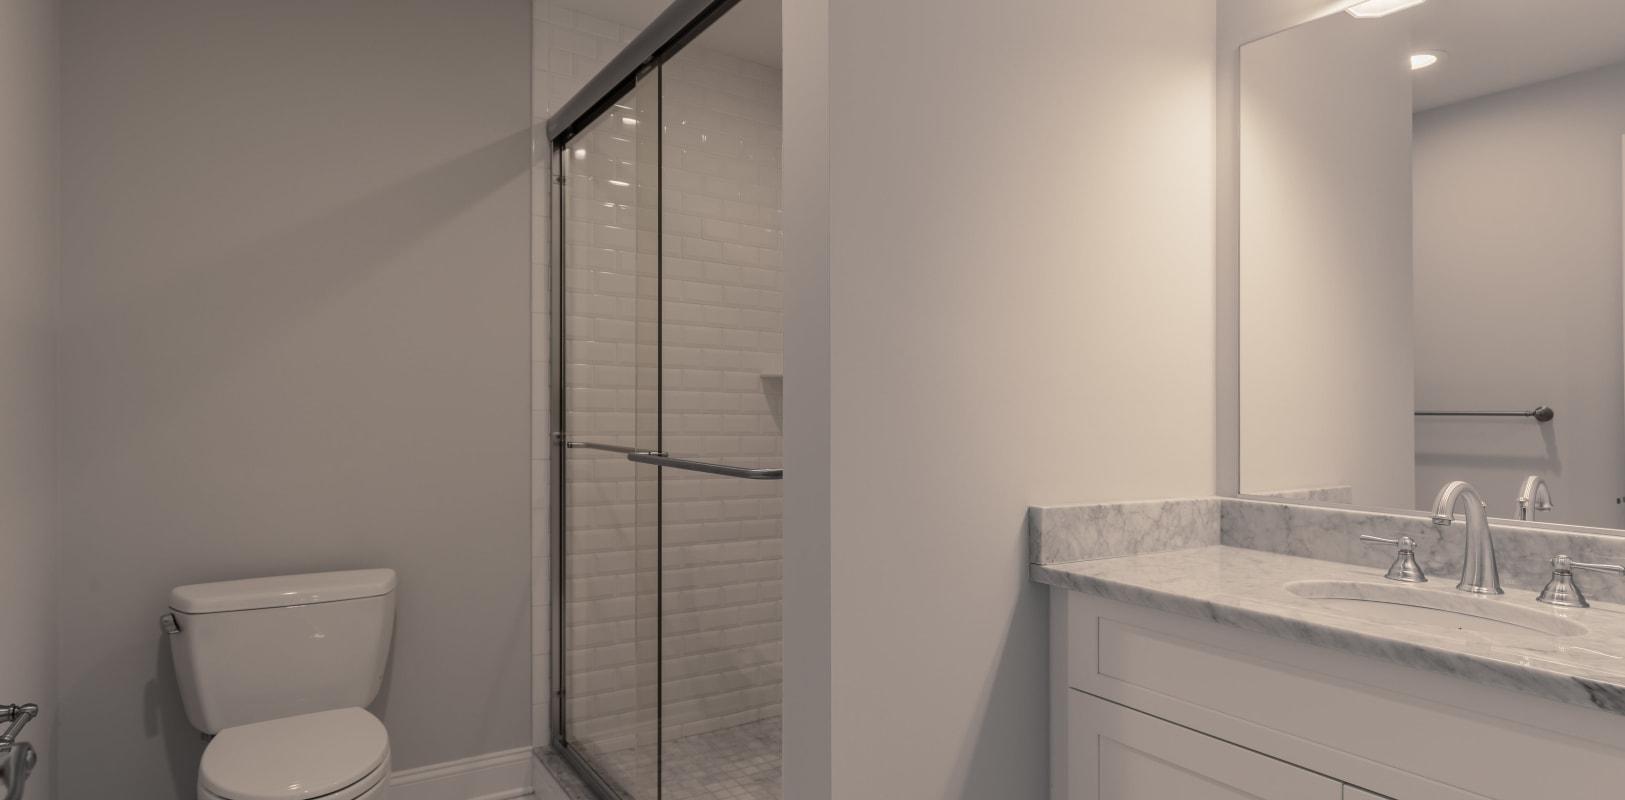 Bathroom with nice shower at Zephyr Ridge in Cedar Grove, New Jersey